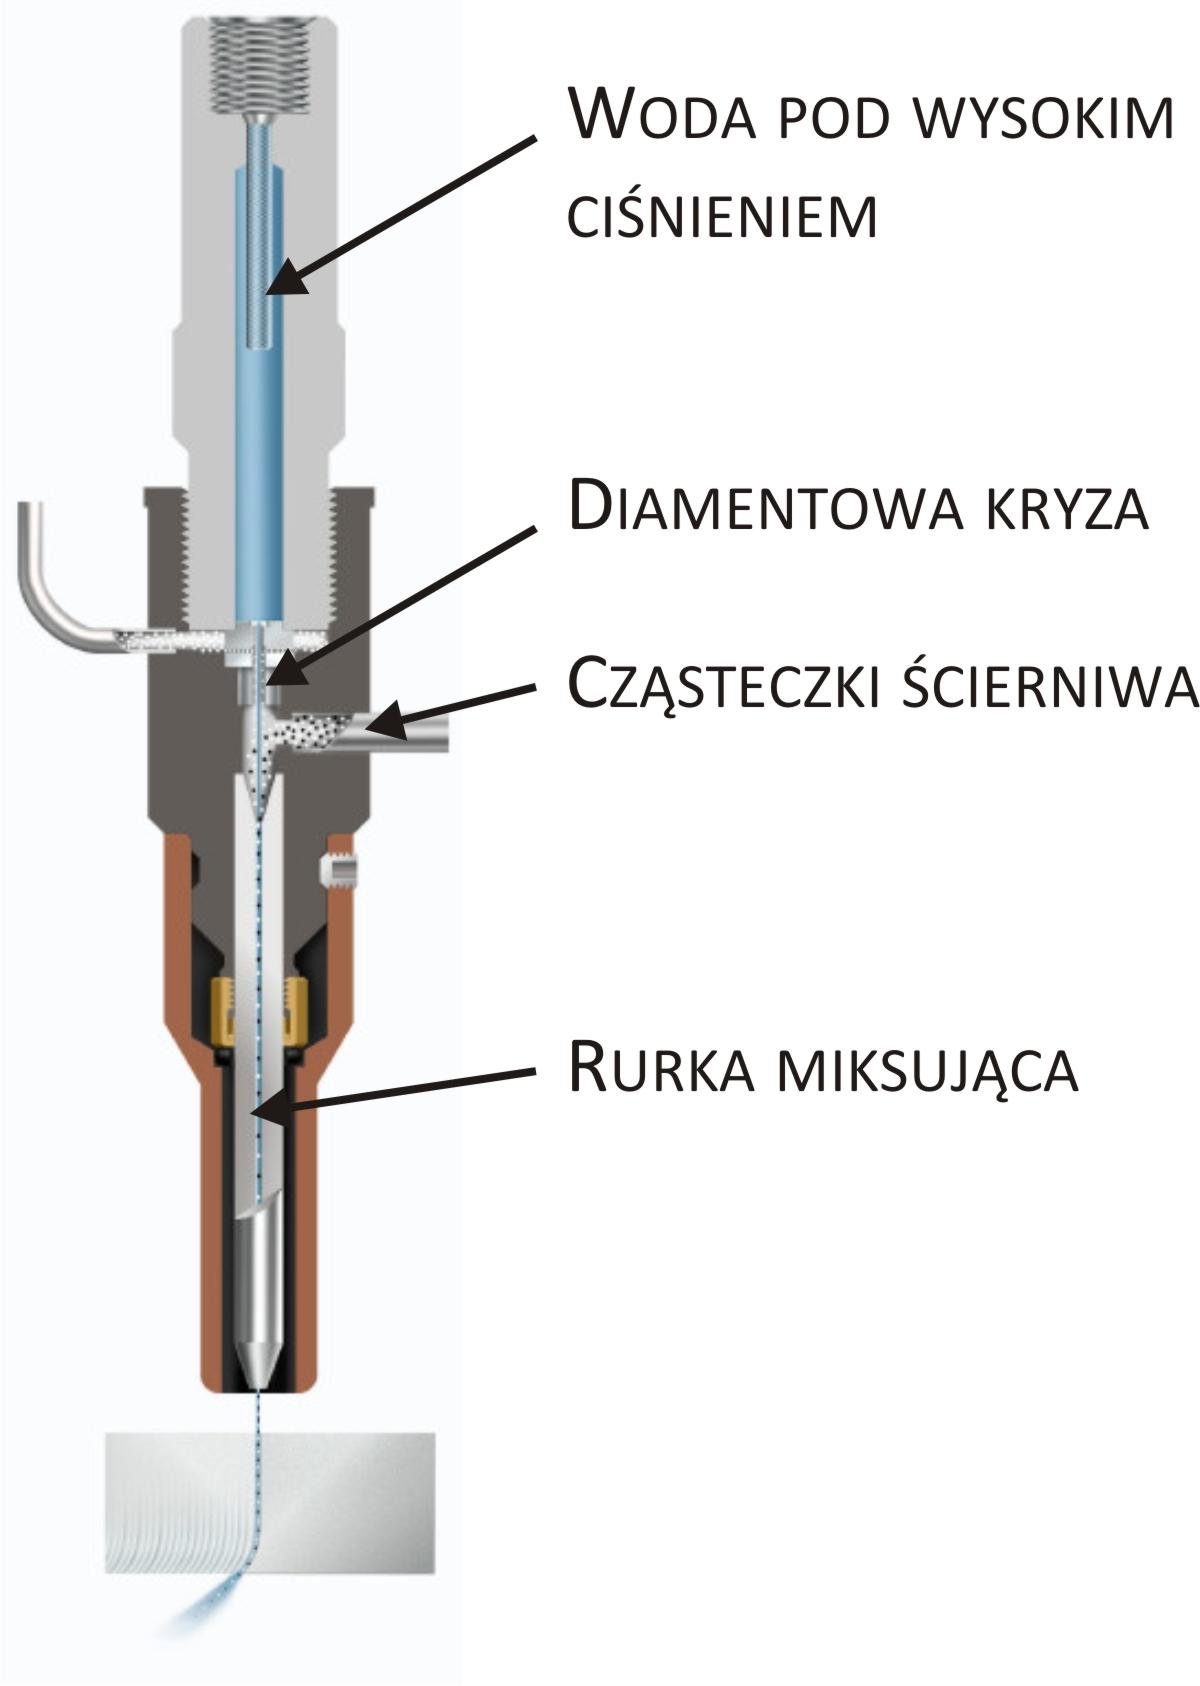 nozzle cutaway